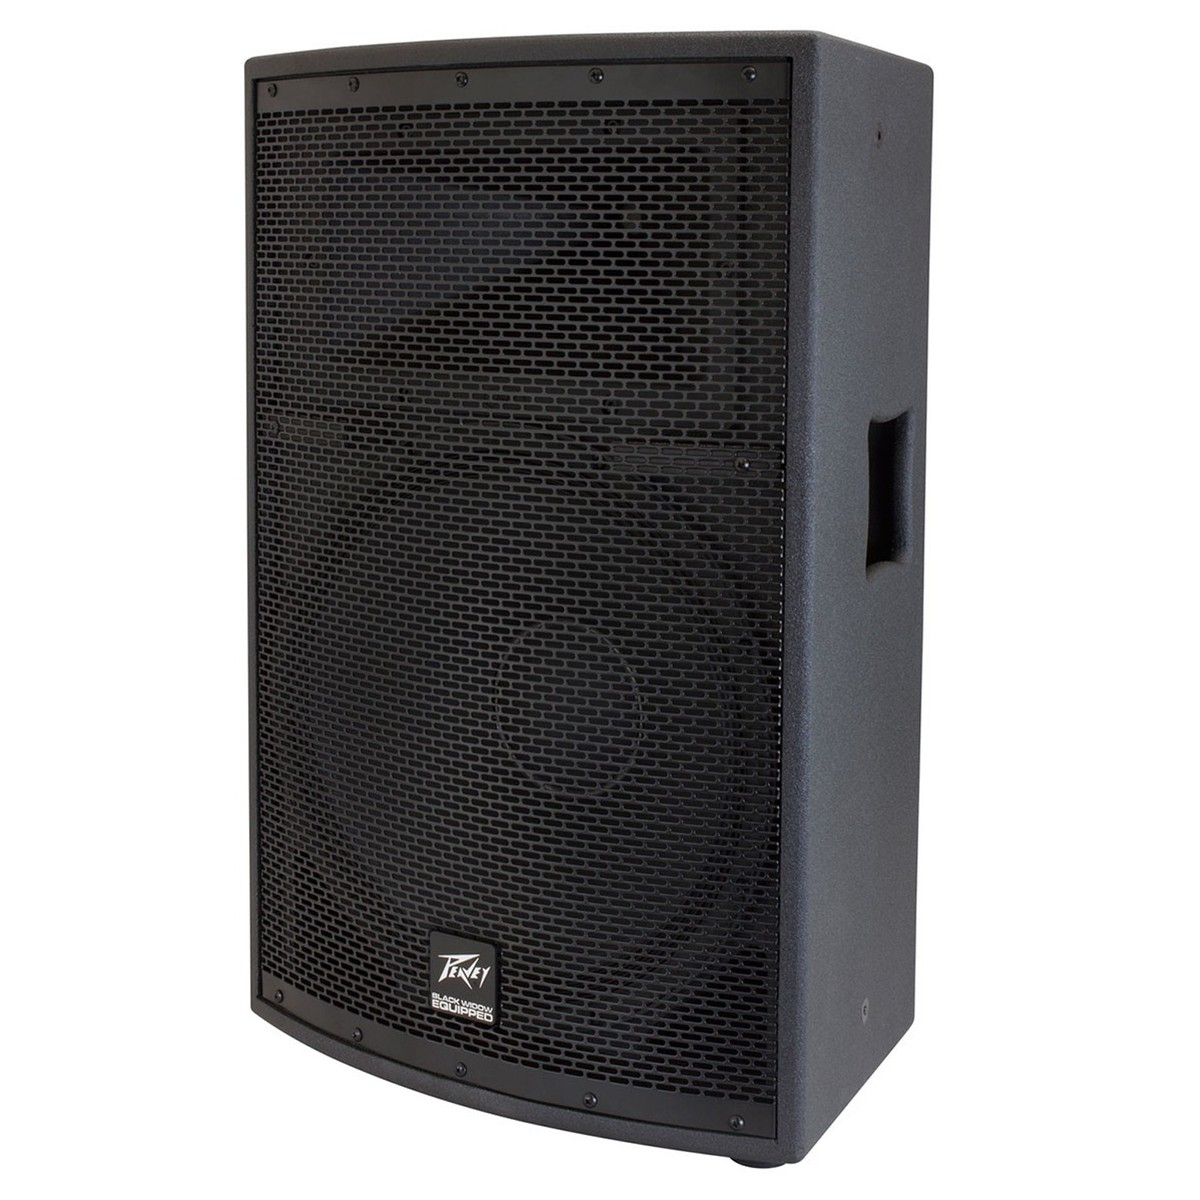 peavey sp series sp2 speaker enclosure at gear4music. Black Bedroom Furniture Sets. Home Design Ideas